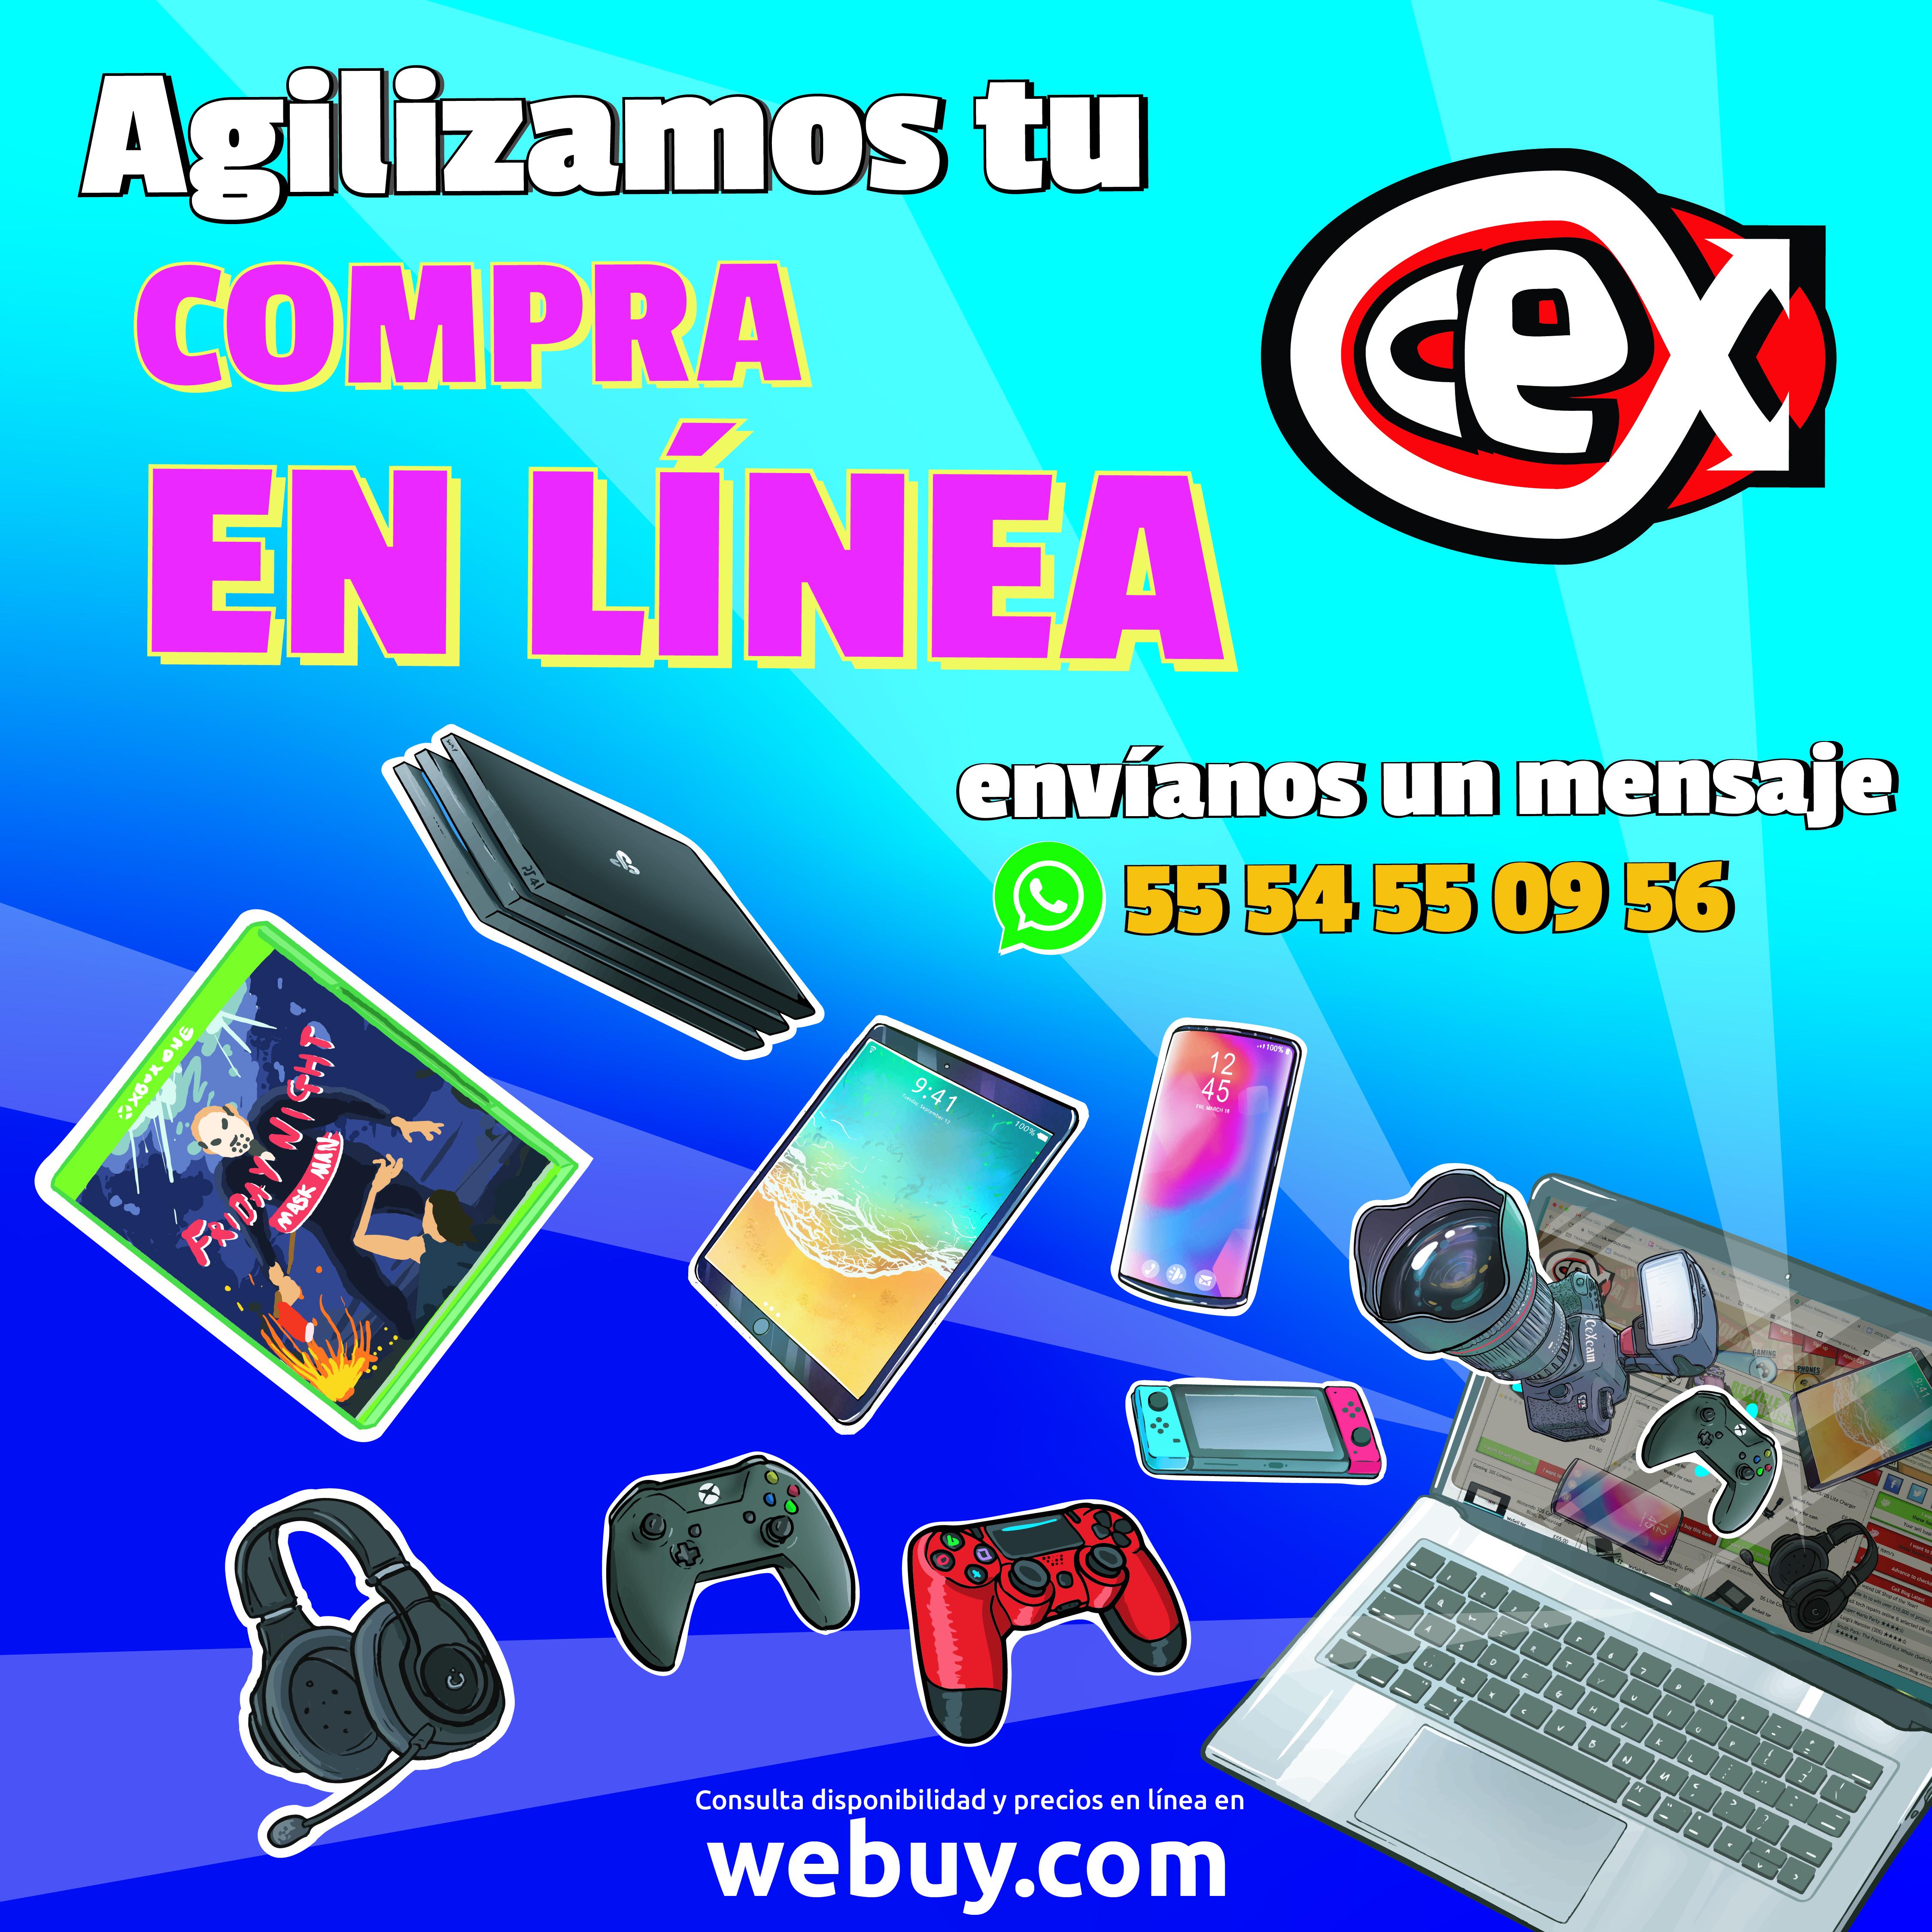 Ecomm express-01